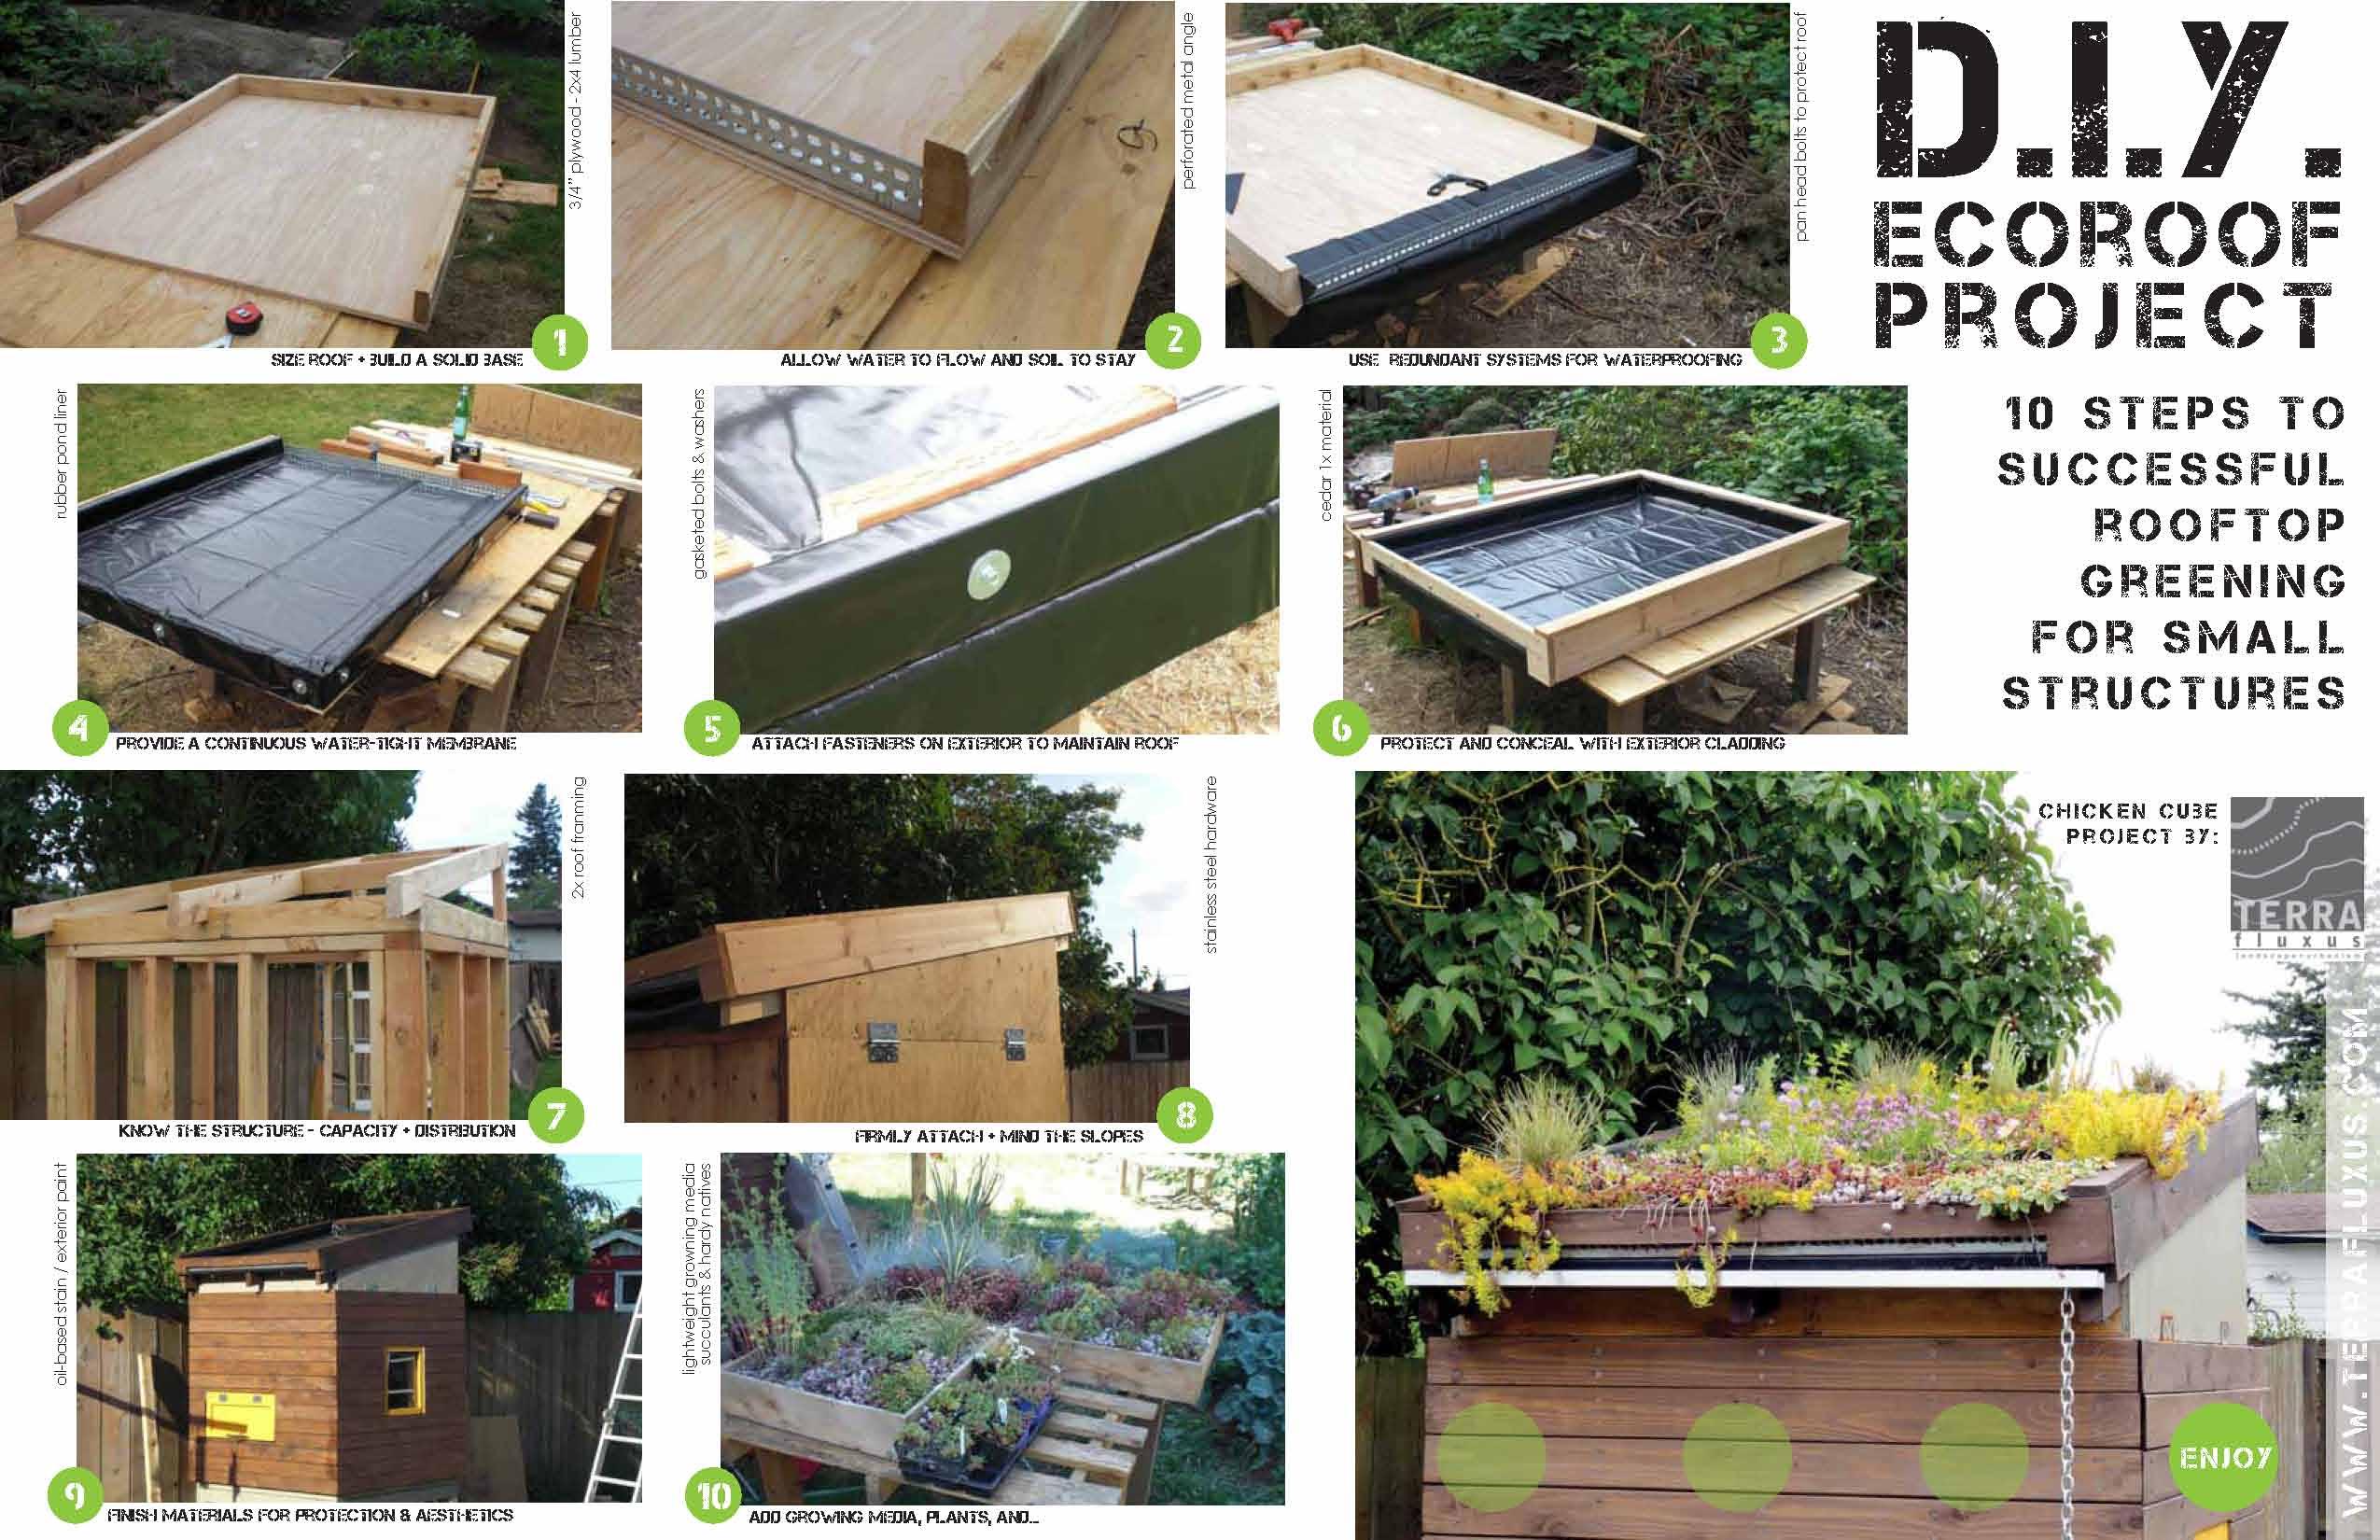 Diy Yard Projects T E R R A F L U X U S A Diy Ecoroofs